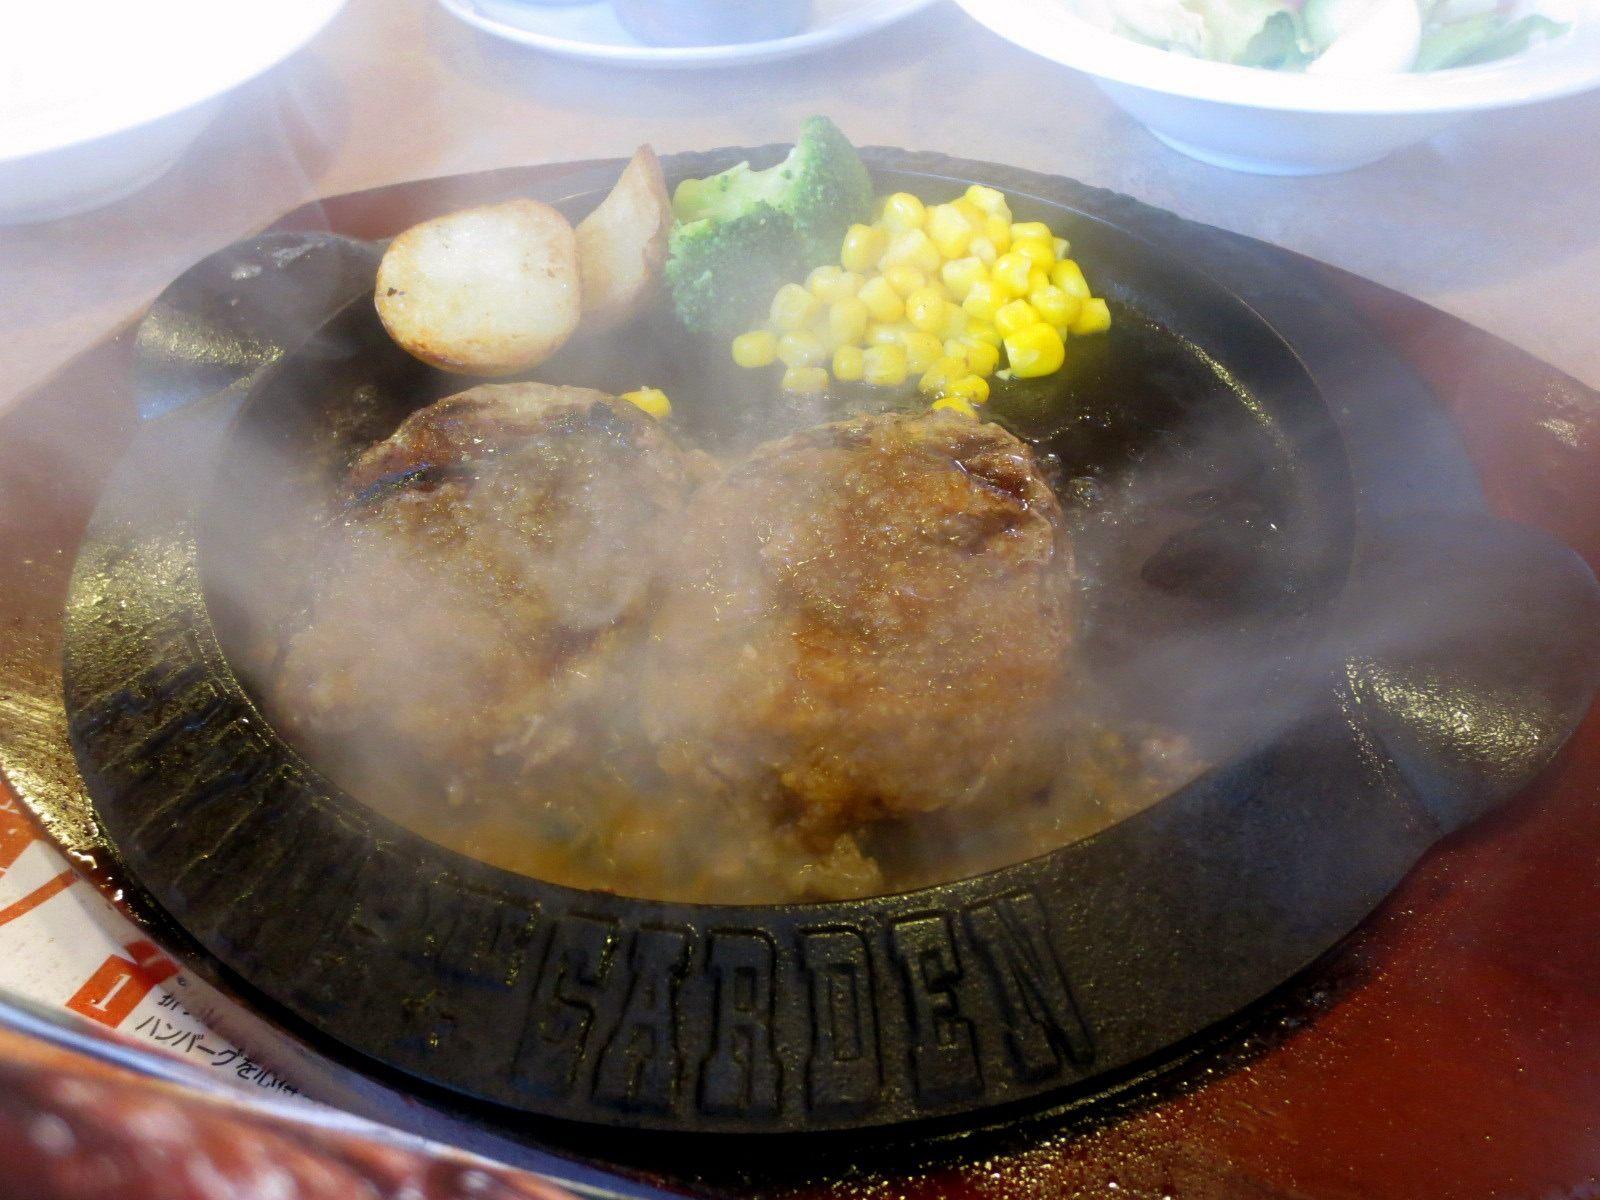 Bakudan Hamburg Steak in a Cloud of Smoke